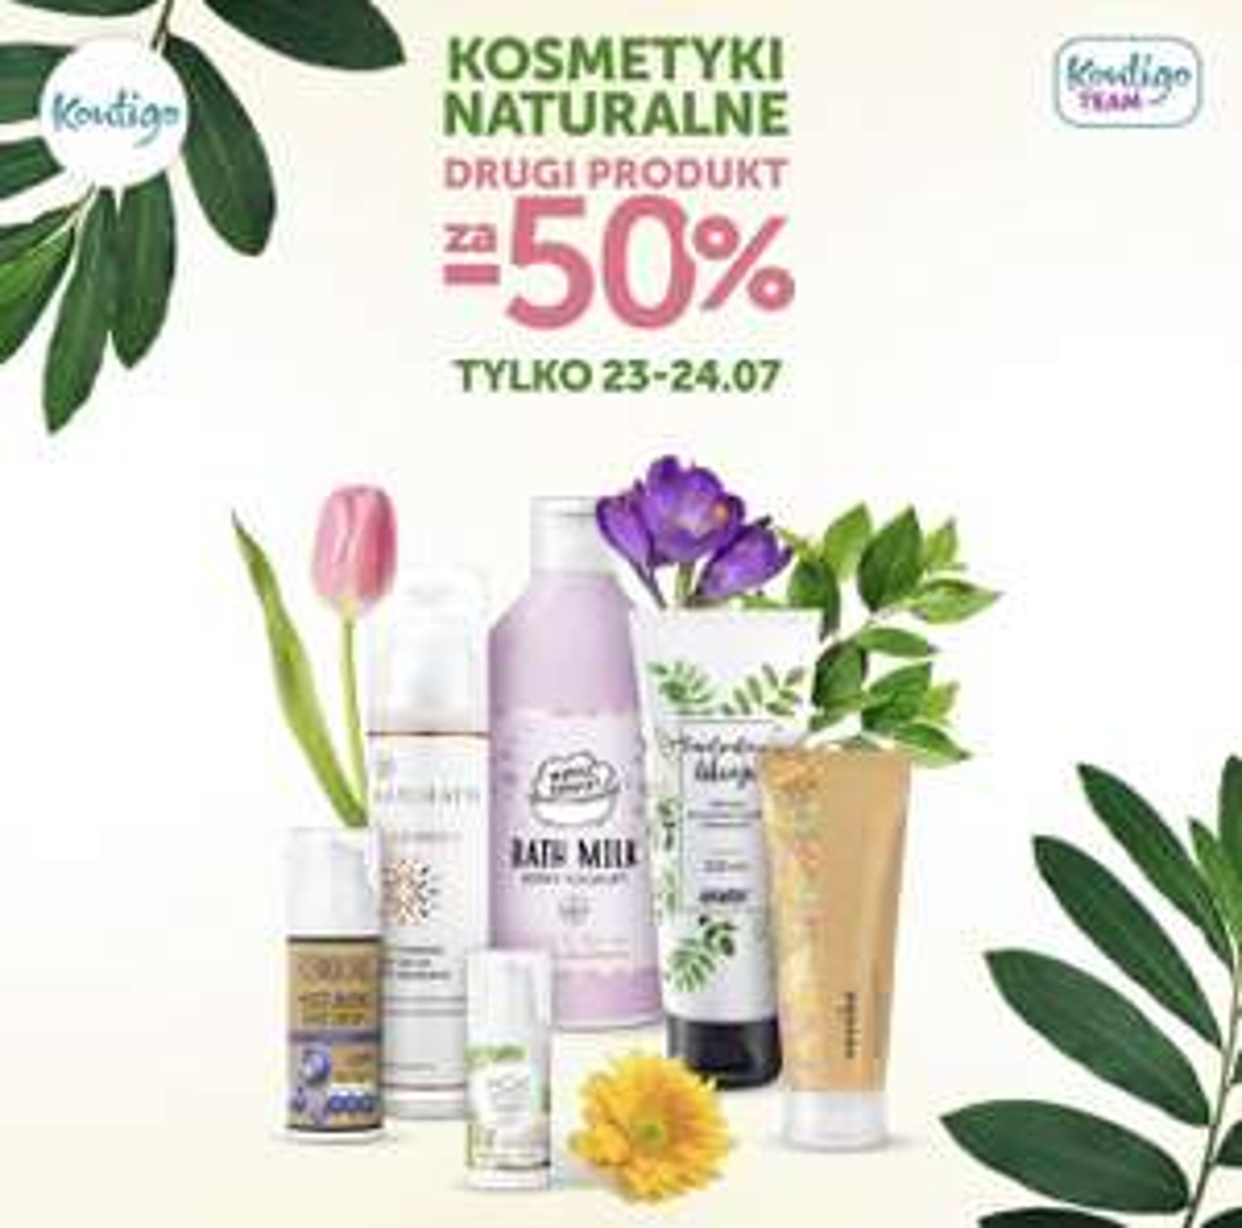 50% zniżki na drugi produkt w @Kontigo - marki naturalne tj. Resibo, Anwen, Clochee